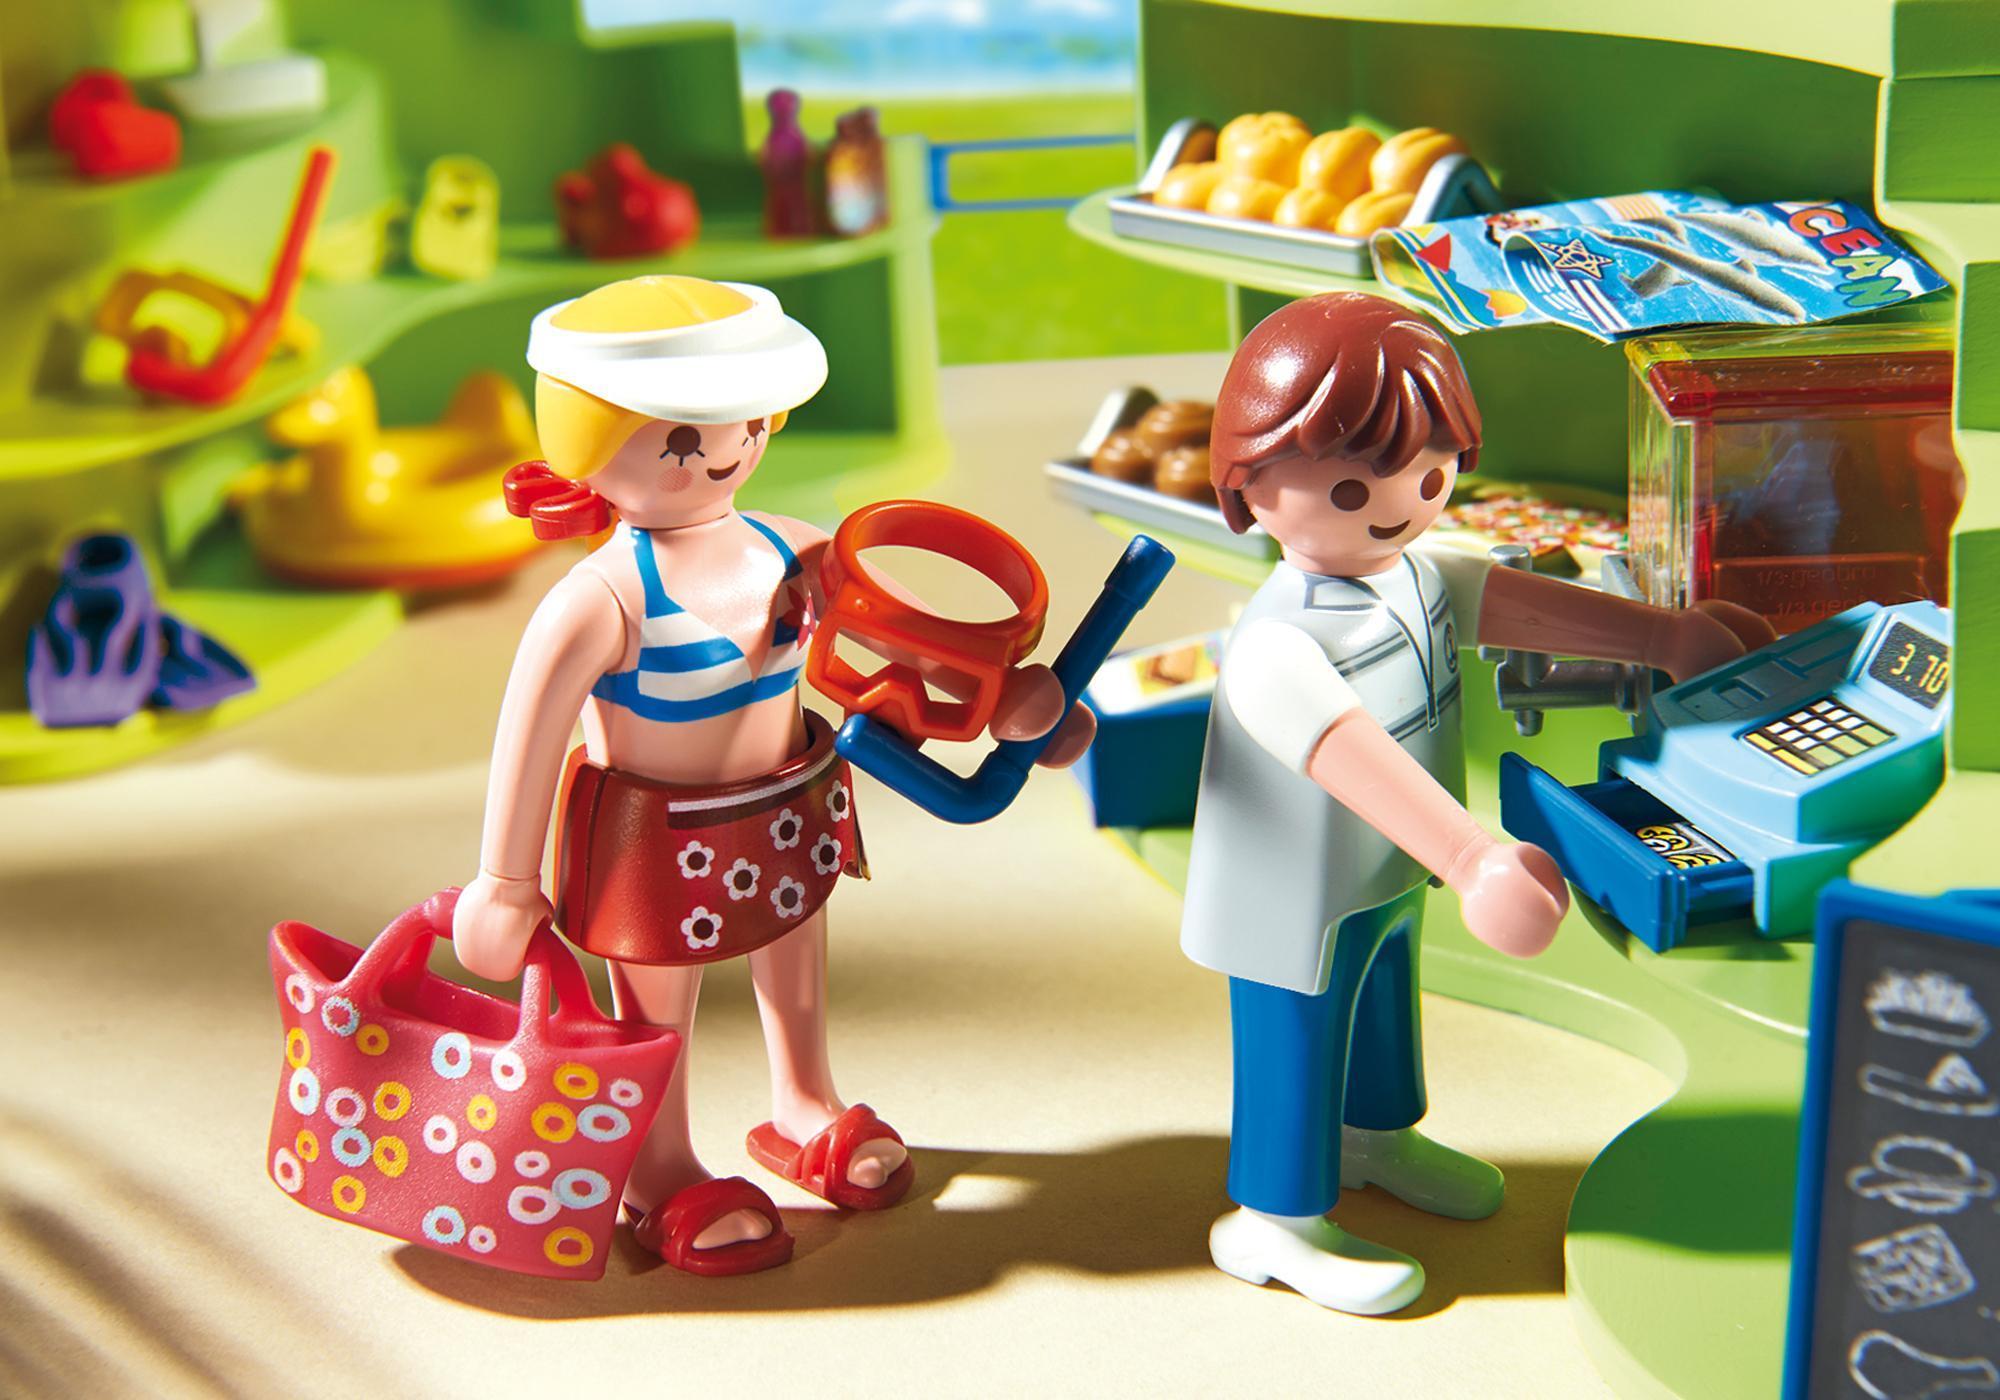 http://media.playmobil.com/i/playmobil/6672_product_extra1